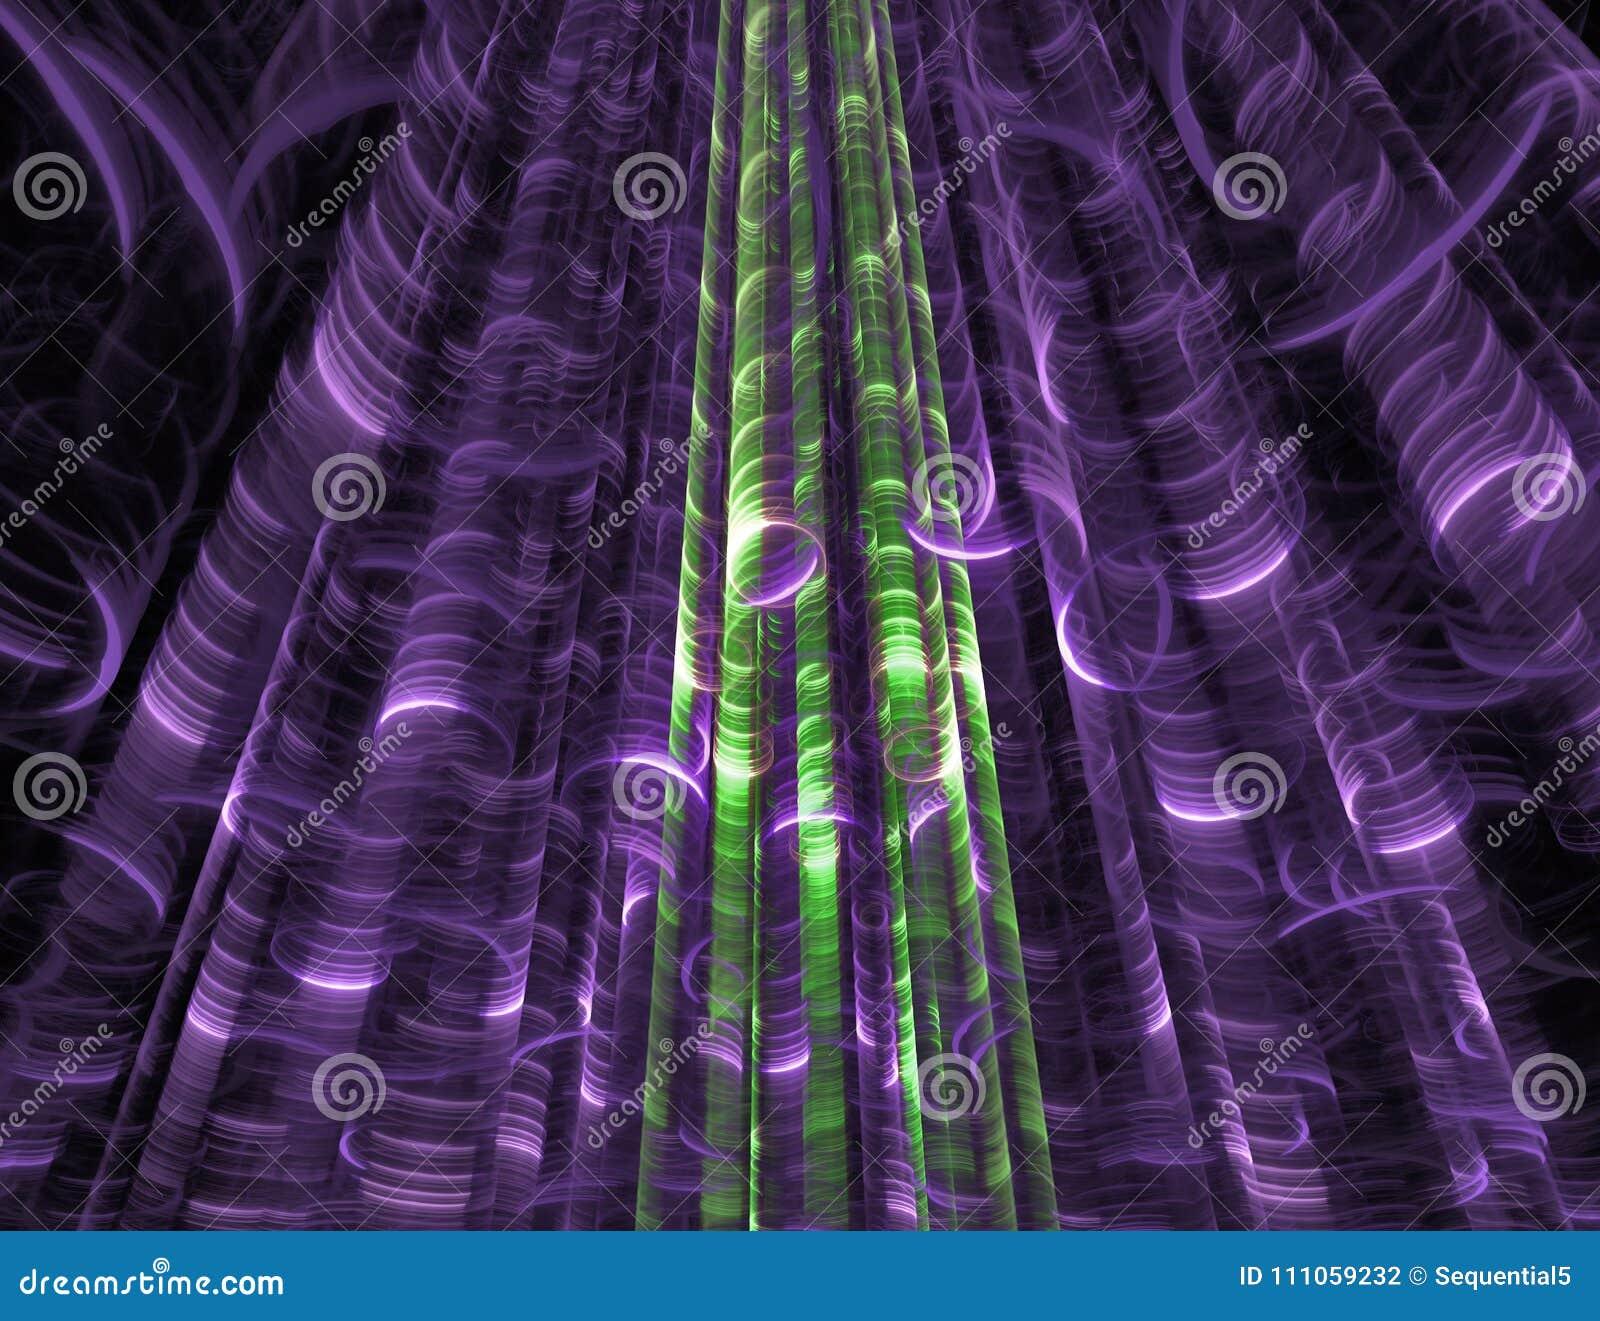 Purple and green alien tendrils